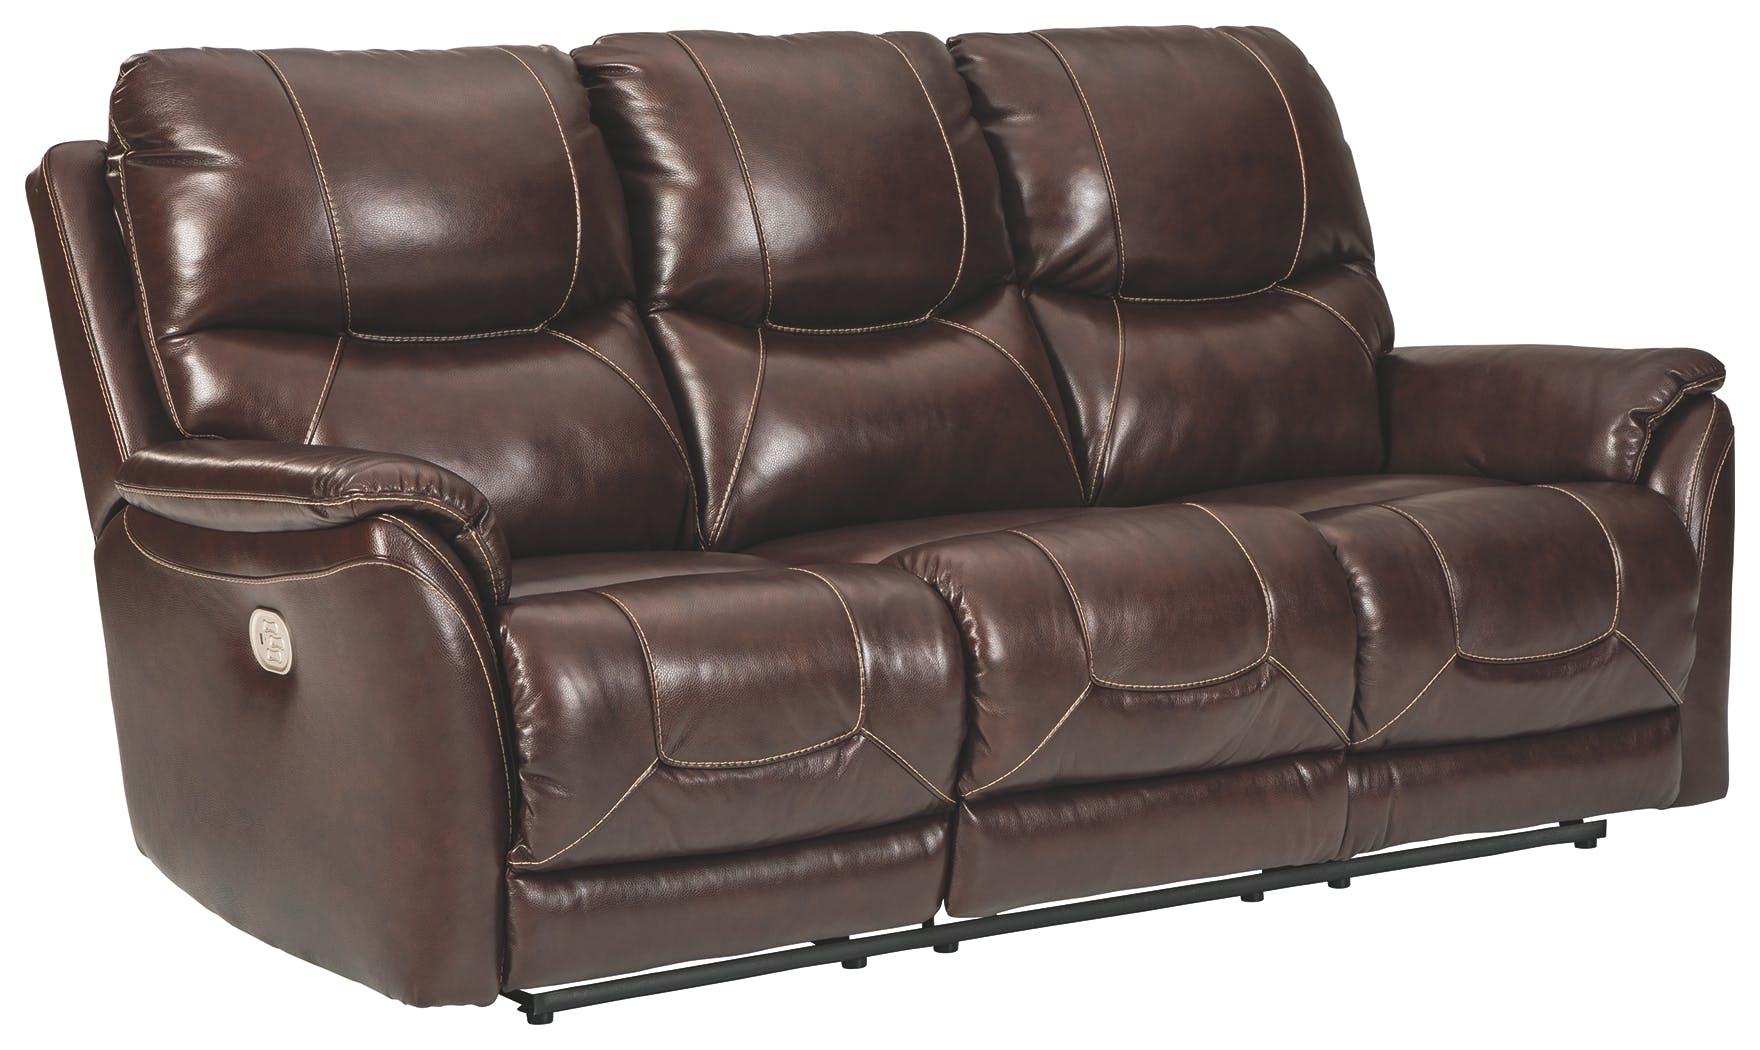 Signature Design By Ashley Living Room Dellington Power Reclining Sofa U1150515 Markson S